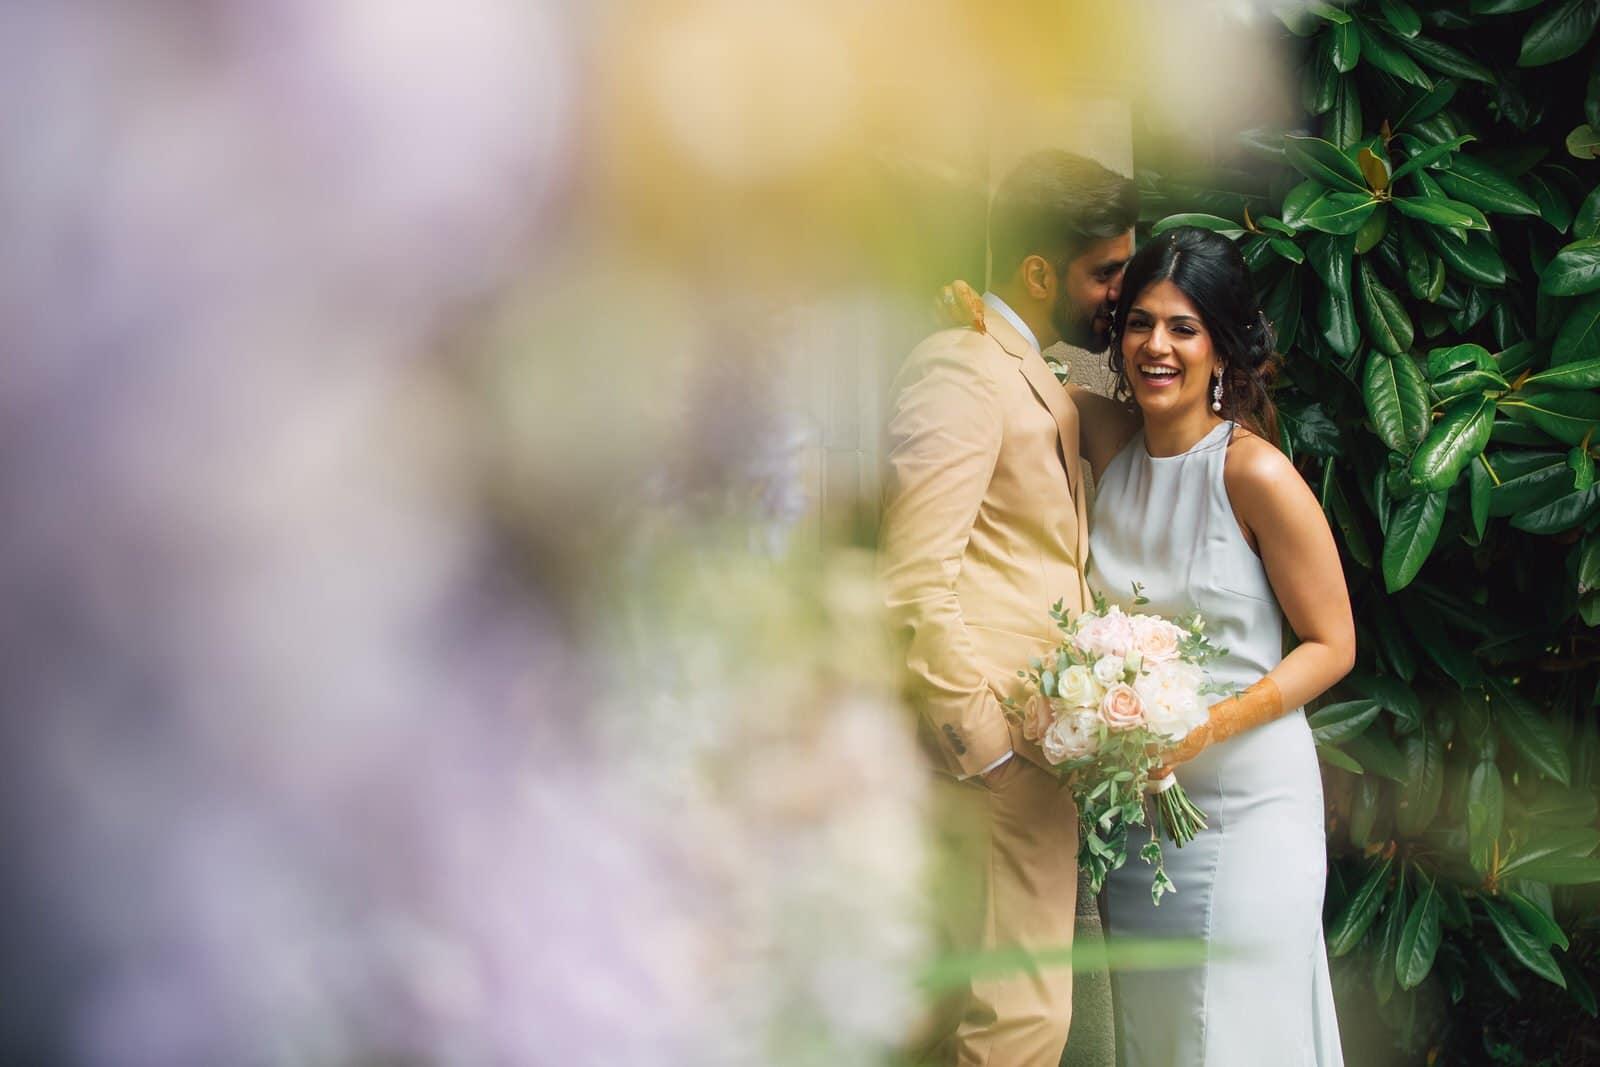 wedding photography at Dunchurch Park Hall